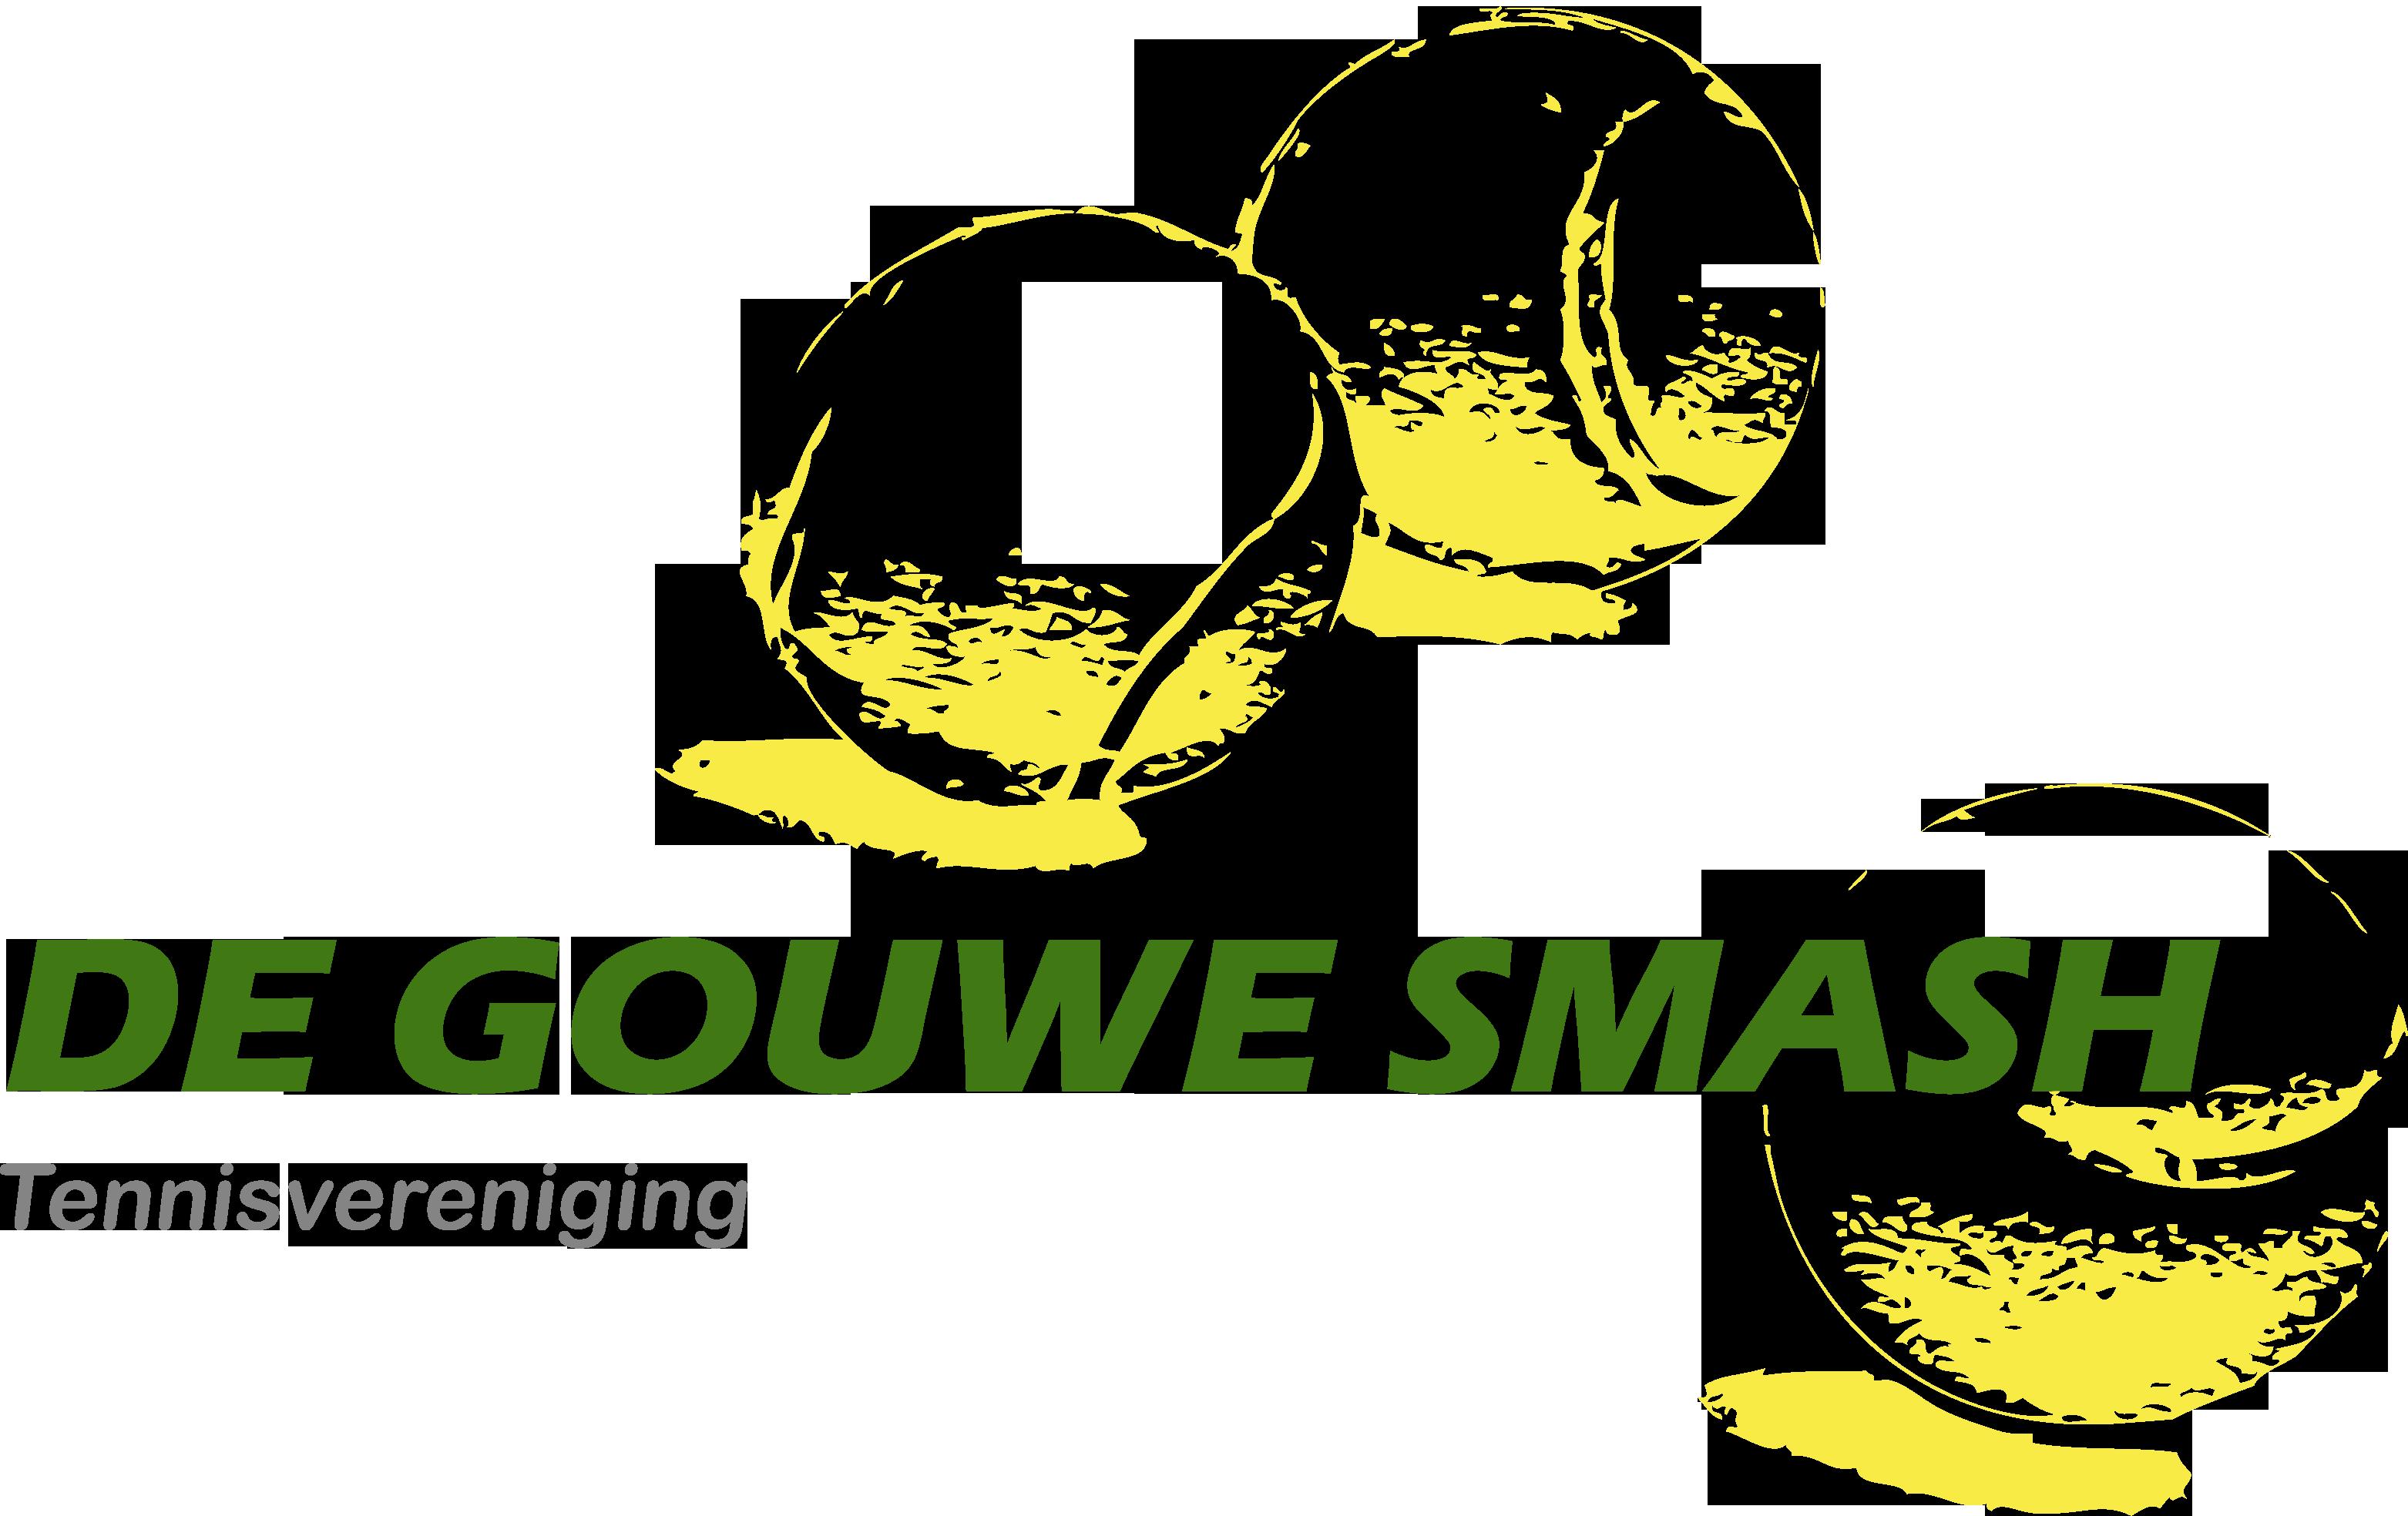 De Gouwe Smash